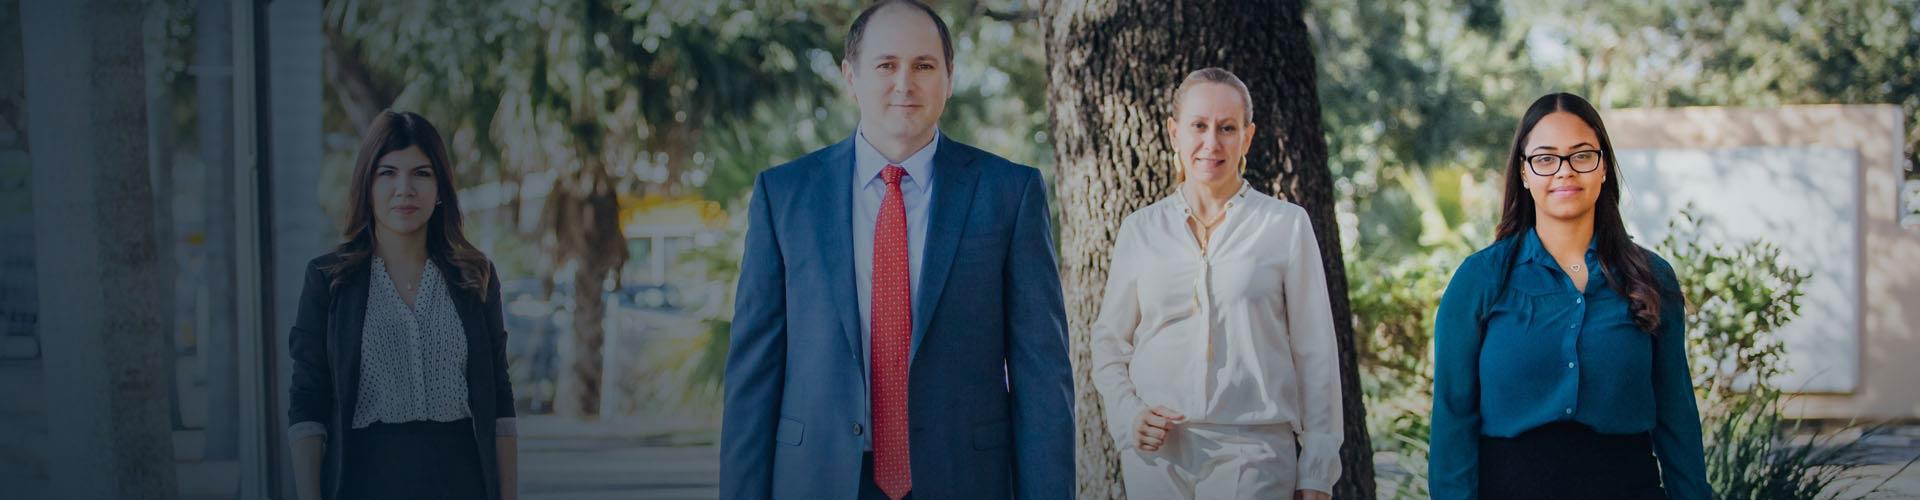 Palm Beach Debt Consolidation Attorneys - Stiberman Law Firm